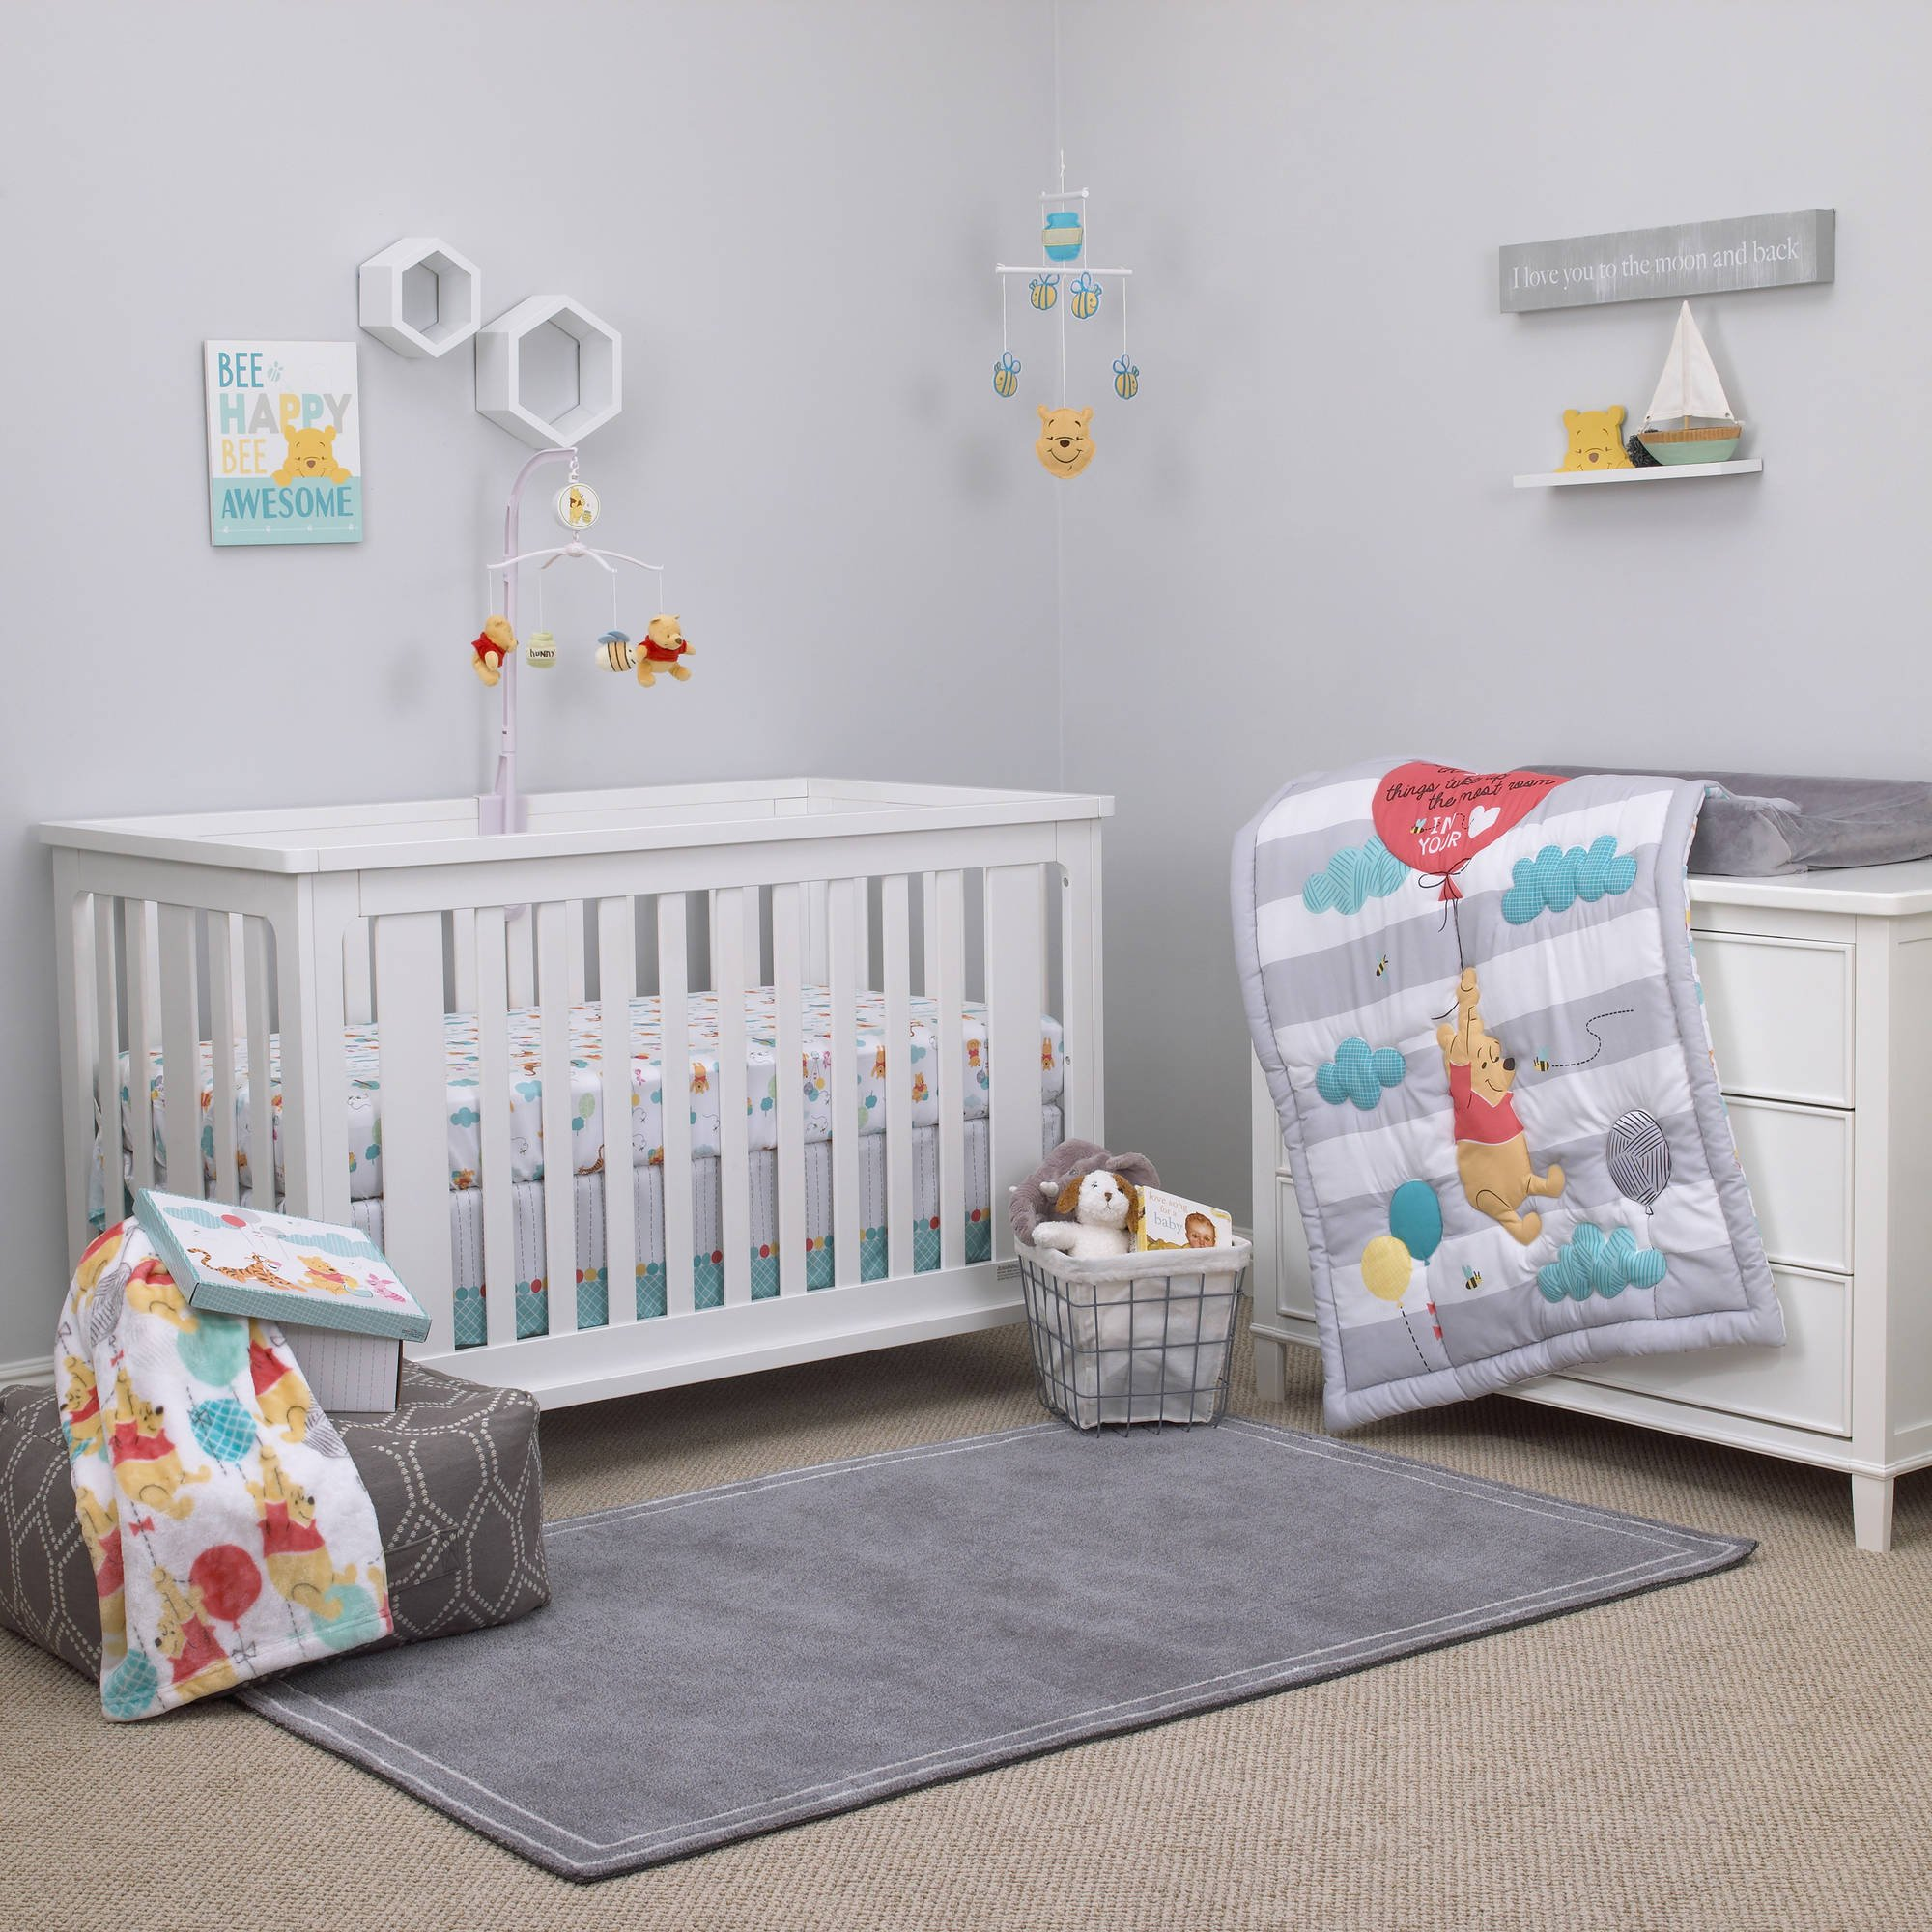 UK 4 Piece White Grey Aqua Baby Winnie the Pooh Crib Bedding Set, Newborn Disney Themed Nursery Bed Set Infant Child Eyeore Tigger Piglet Blanket Comforter Stripe Ballon Polka Dot Pattern, Polyester